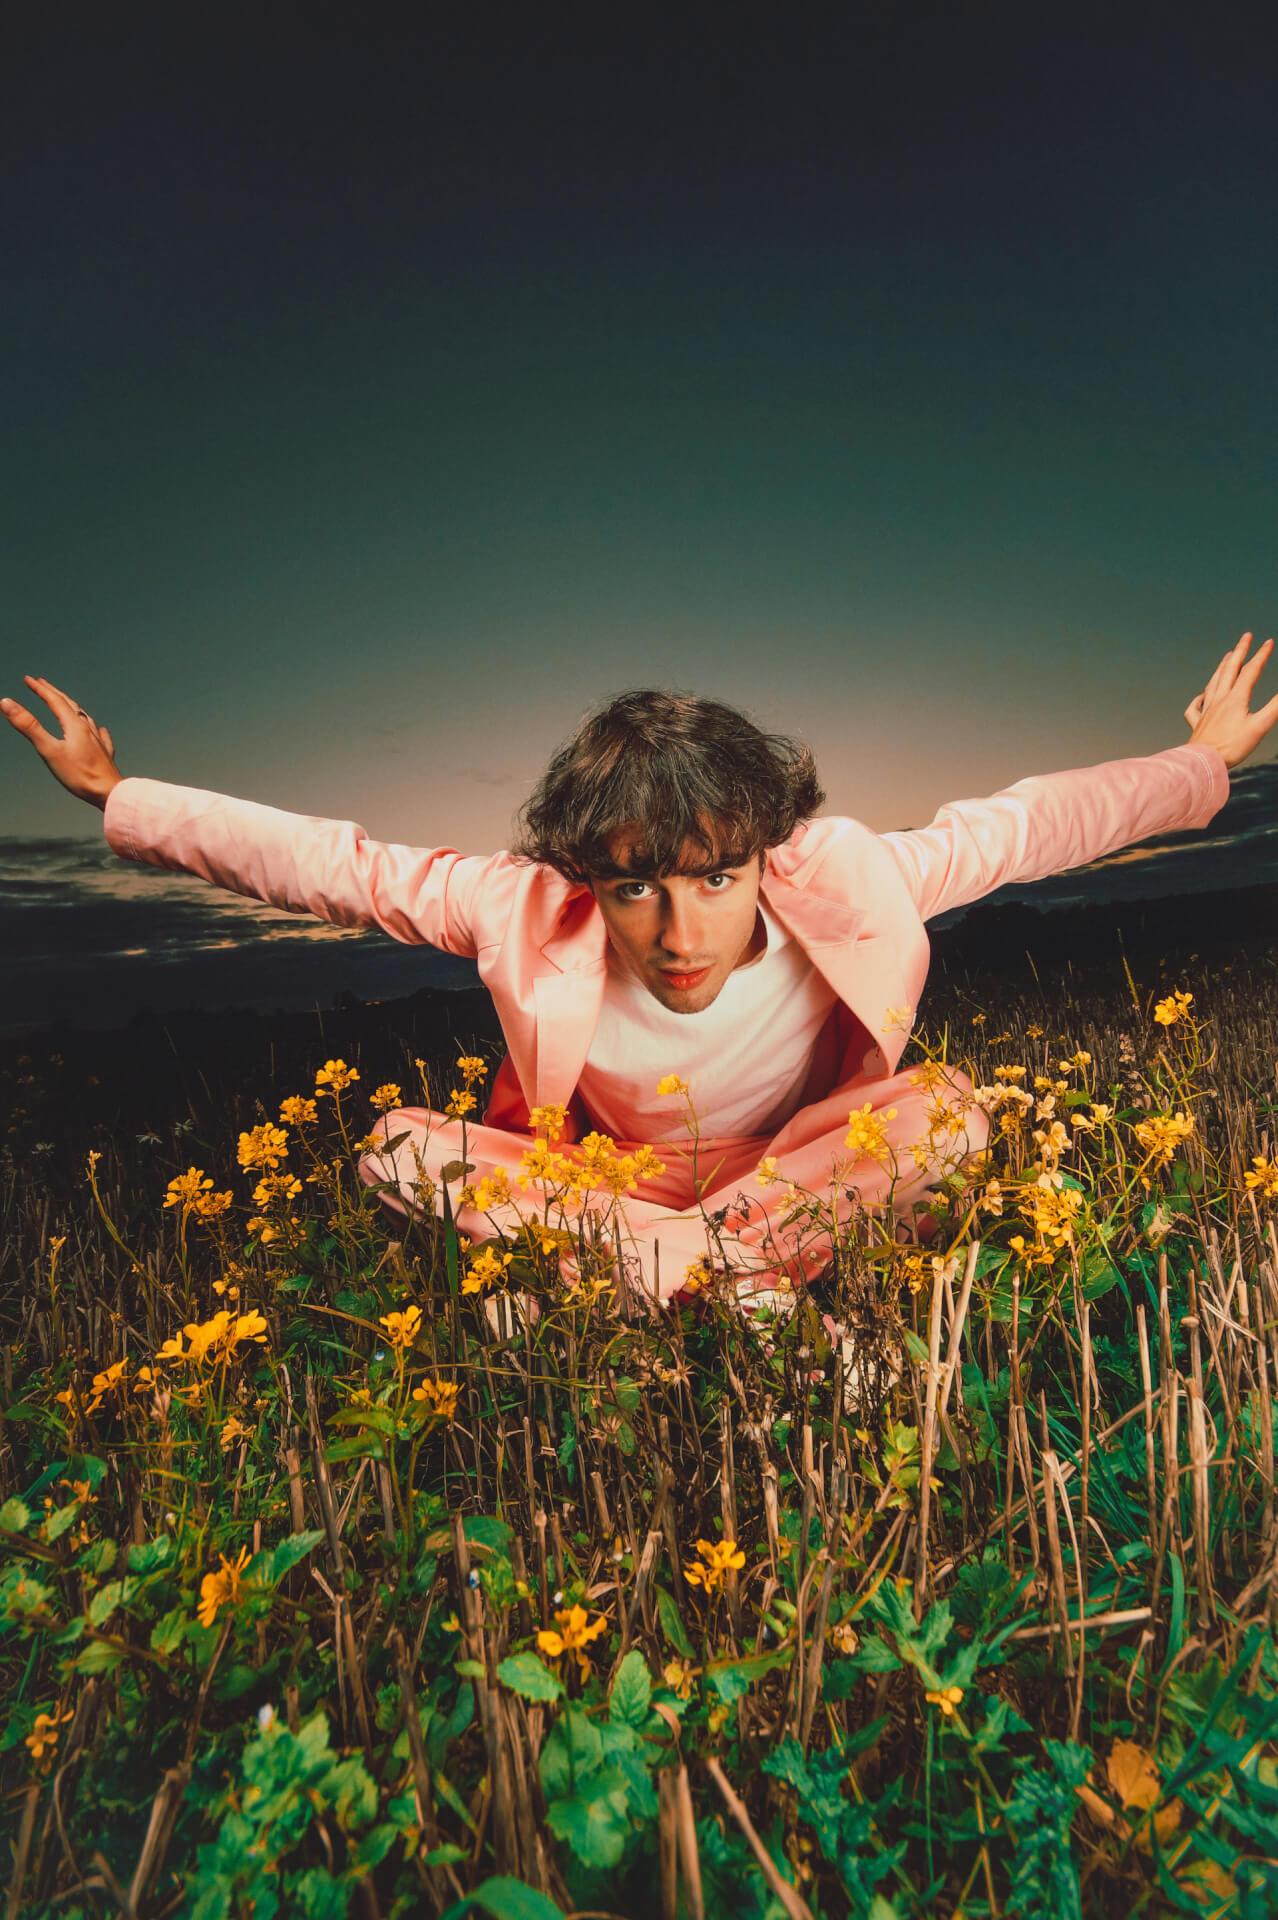 UK出身18歳のSSW・Alfie Templemanが日本の音楽に影響を受けたミニアルバムをリリース!MVも公開 music210510_alfie-empleman-210510_3